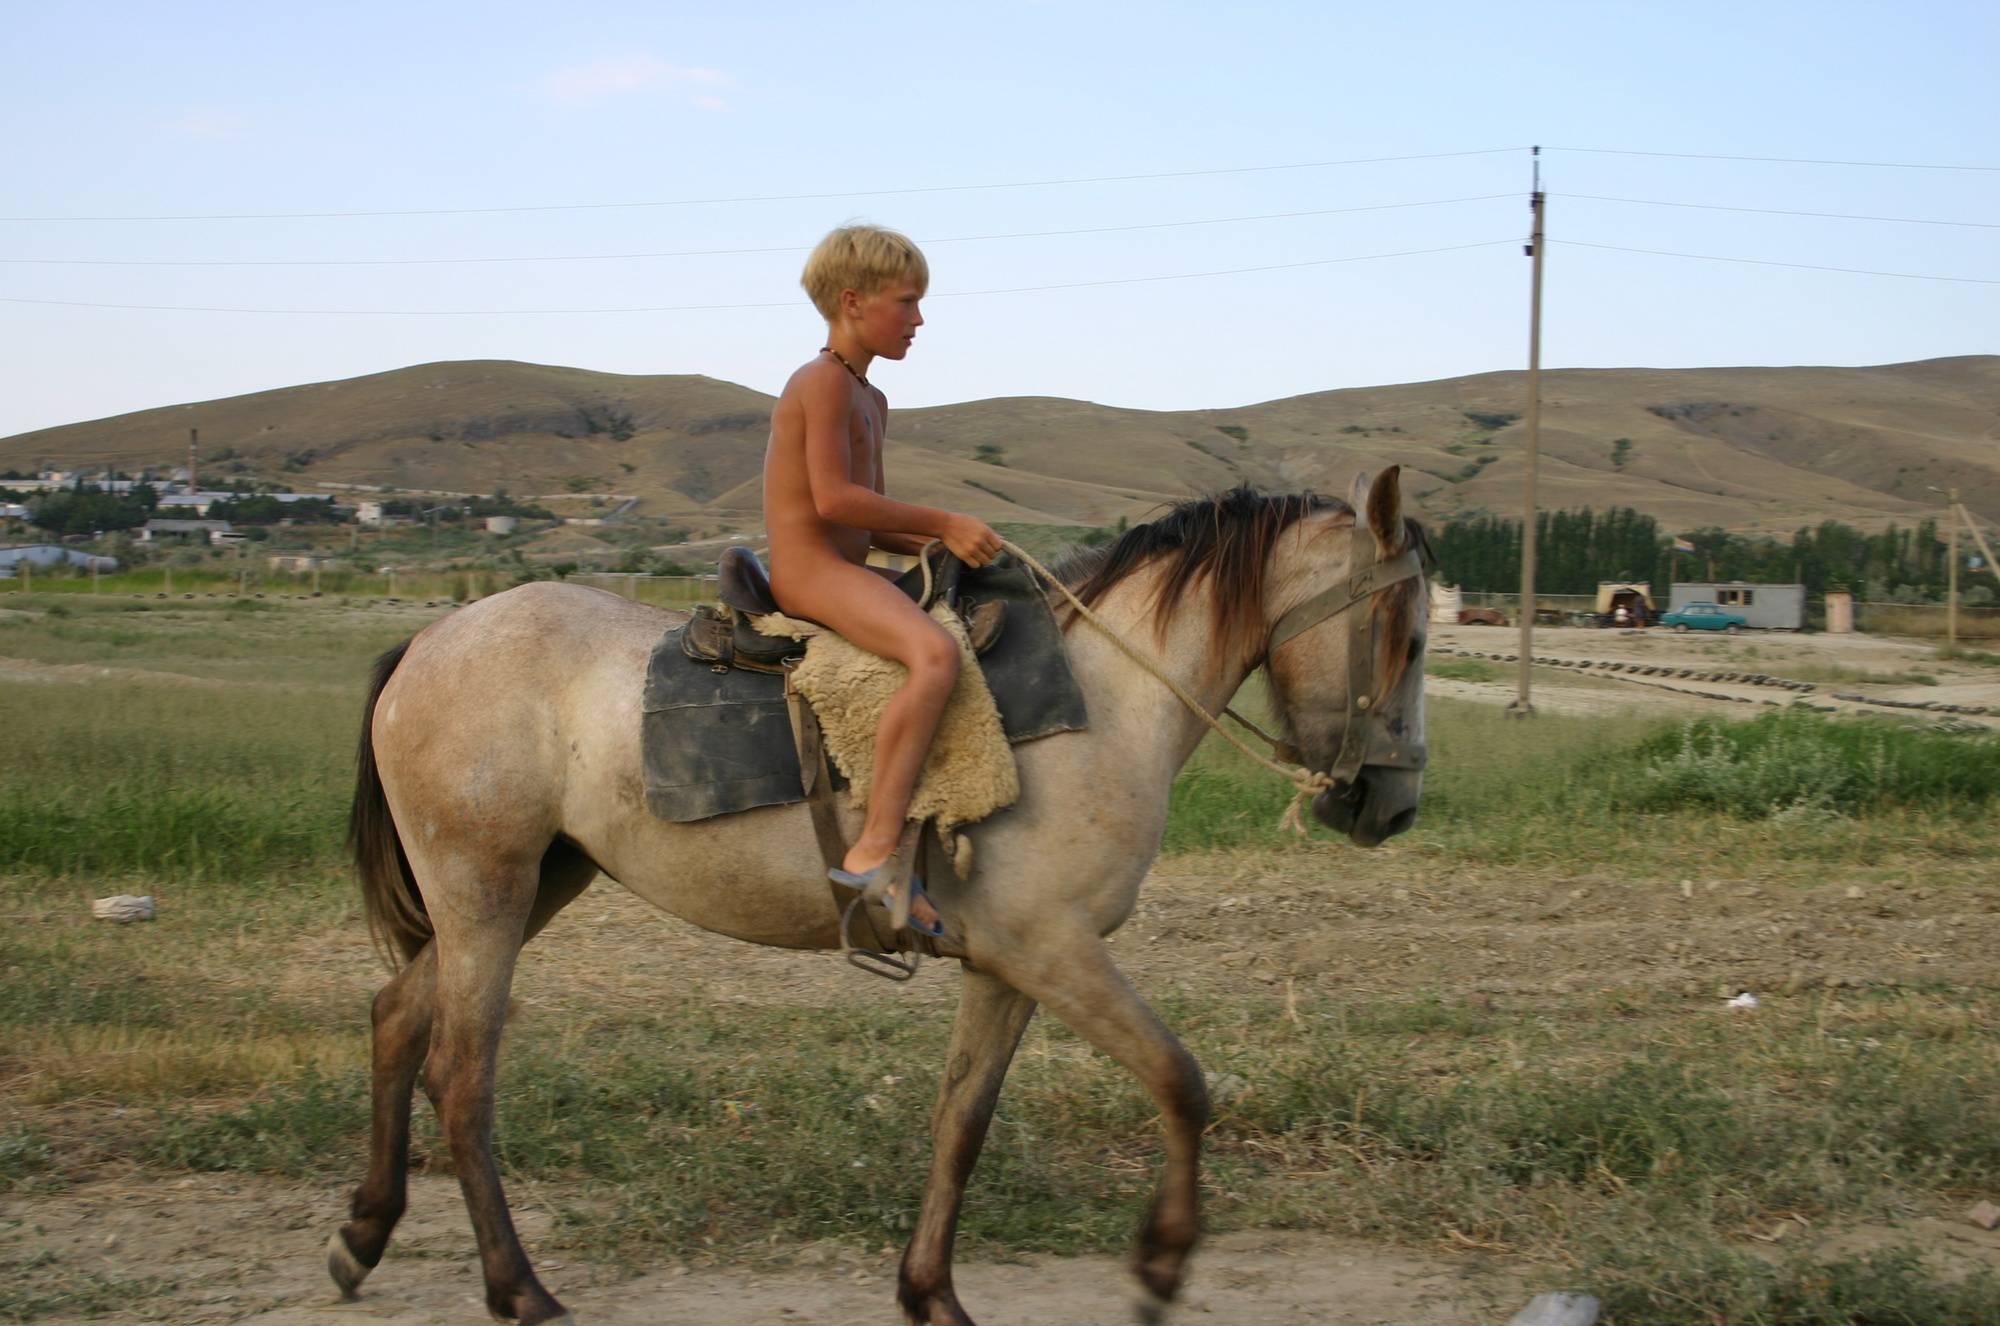 Nudist Gallery Family Horseback Riding - 1